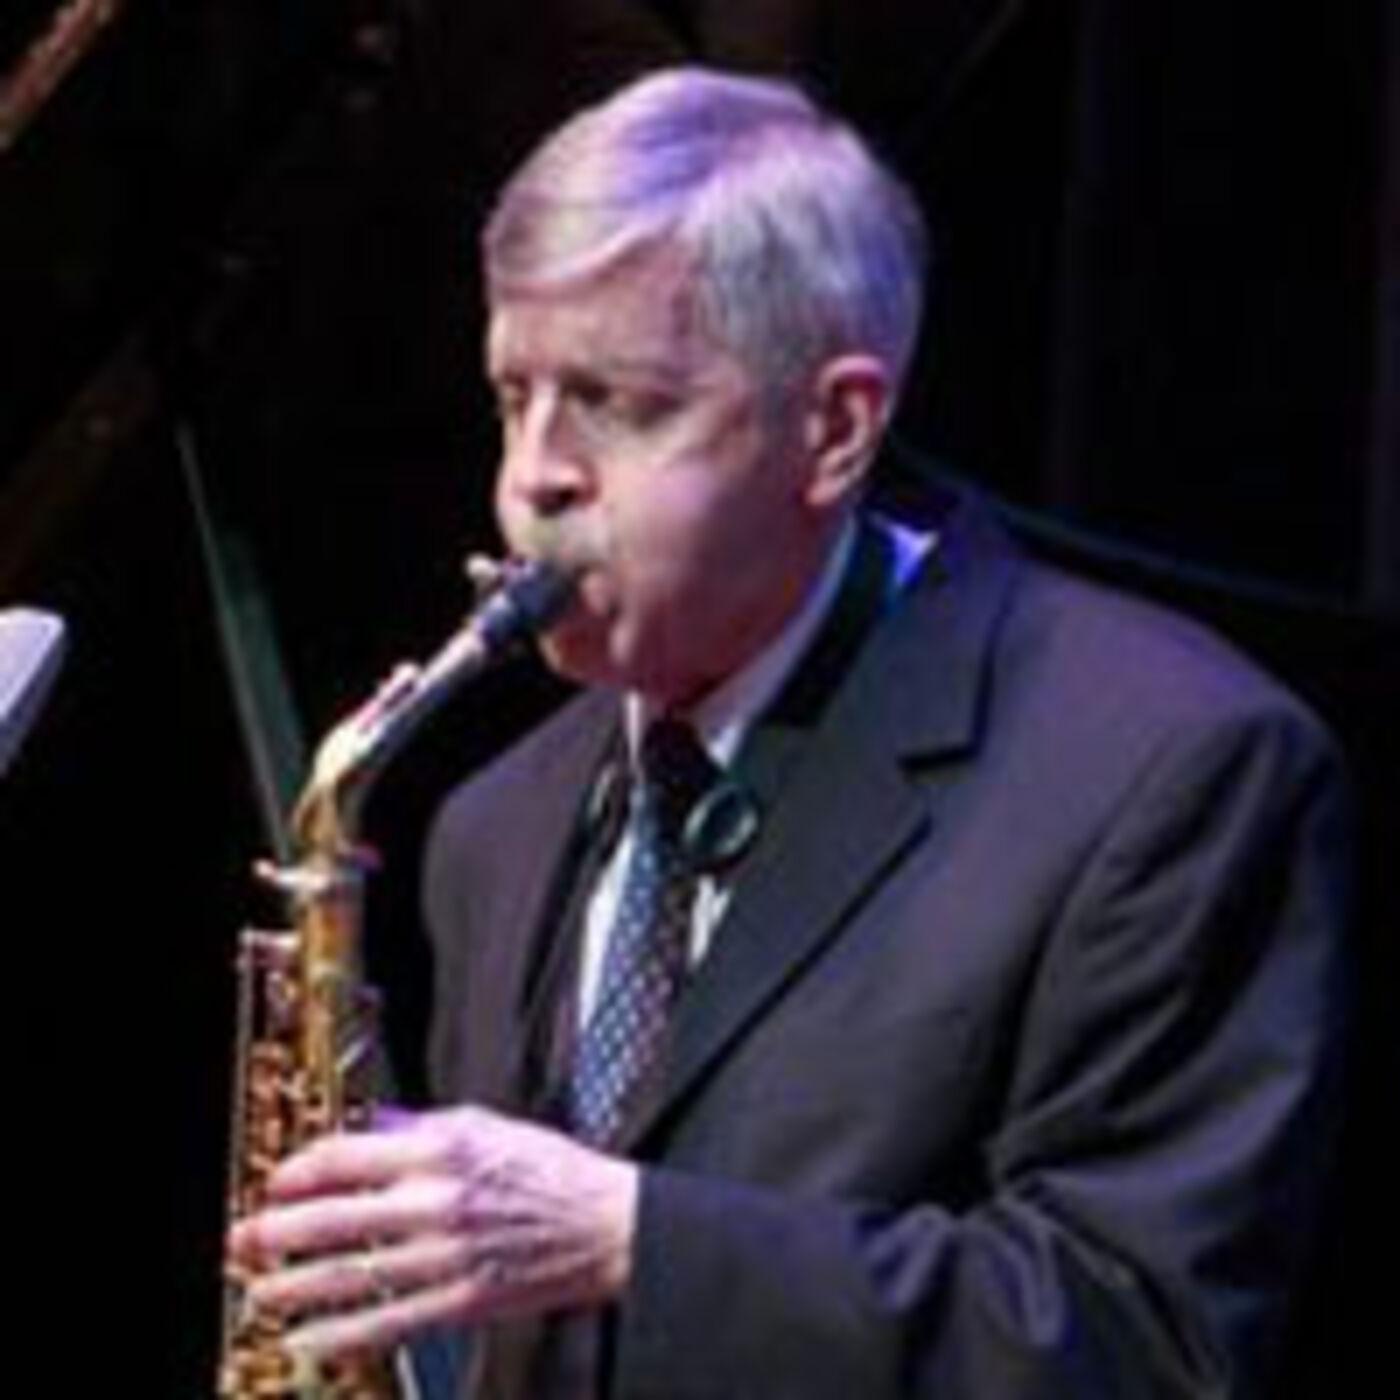 Episode 3 - A conversation with the legendary jazz educator and NEA Jazz Master, Jamey Aebersold.